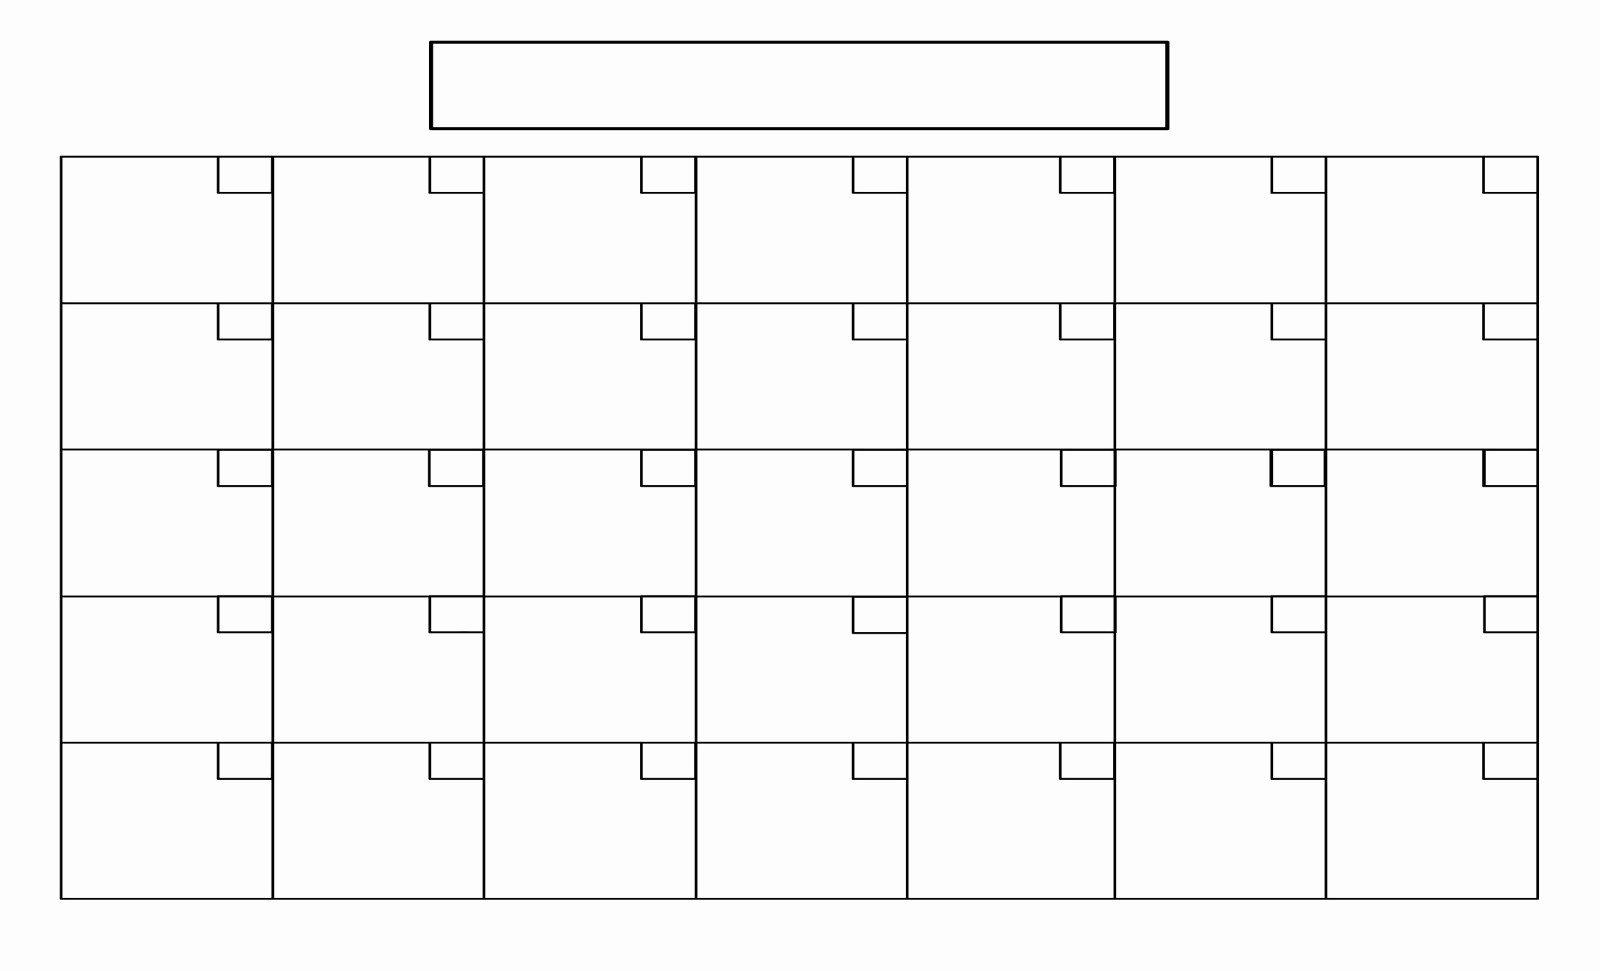 Fill In Calendar Template | Example Calendar Printable Calendar To Fill In And Print